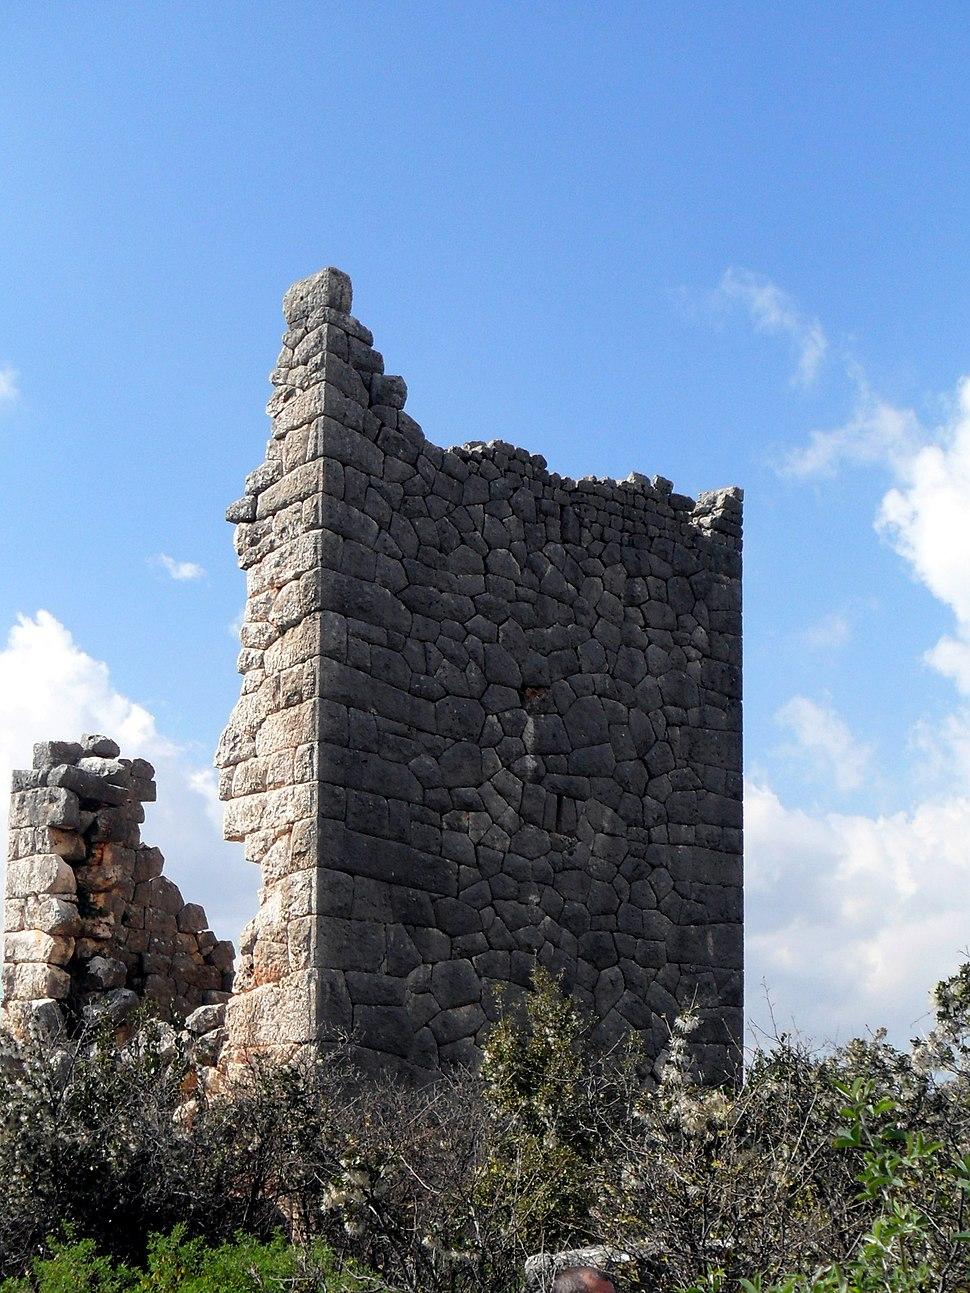 Emirzeli Hellenistic tower, Mersin Province, Turkey